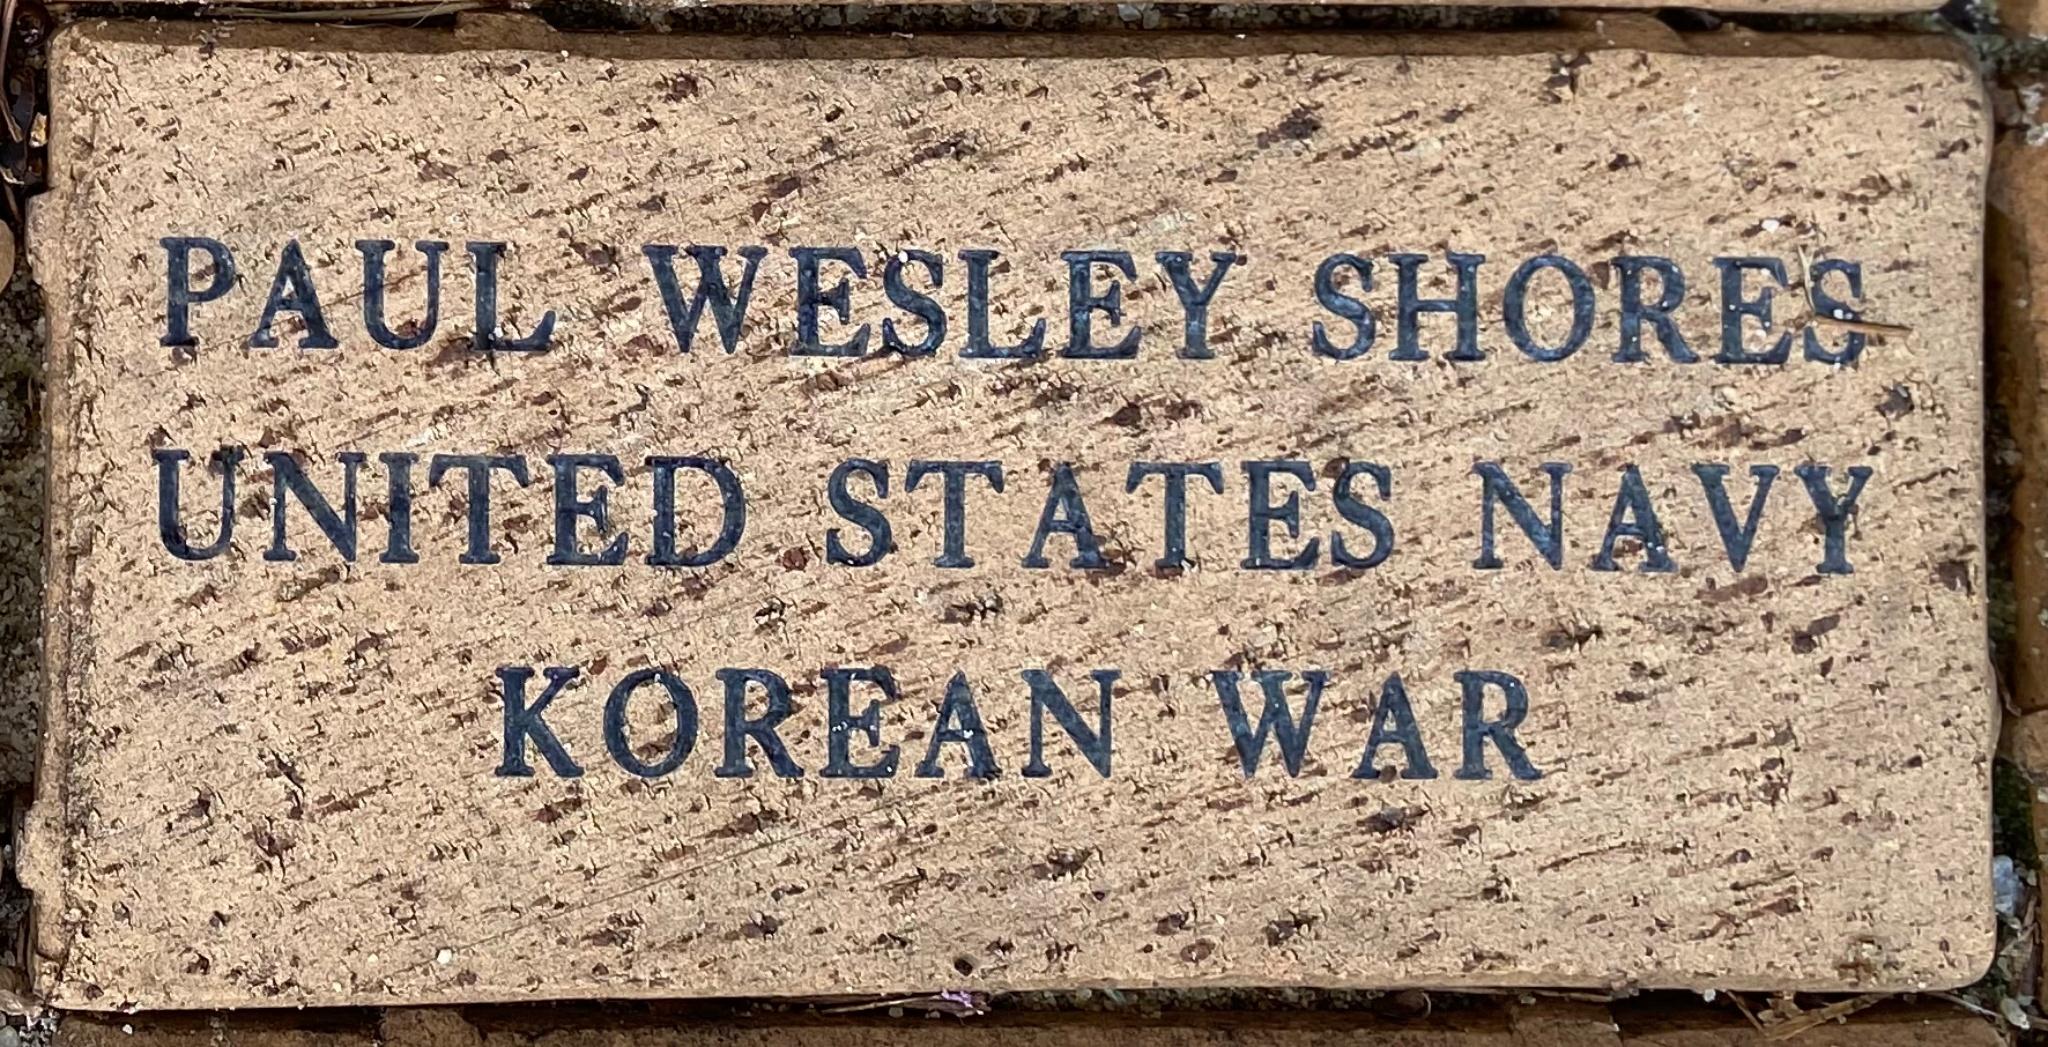 PAUL WESLEY SHORES UNITED STATES NAVY KOREAN WAR